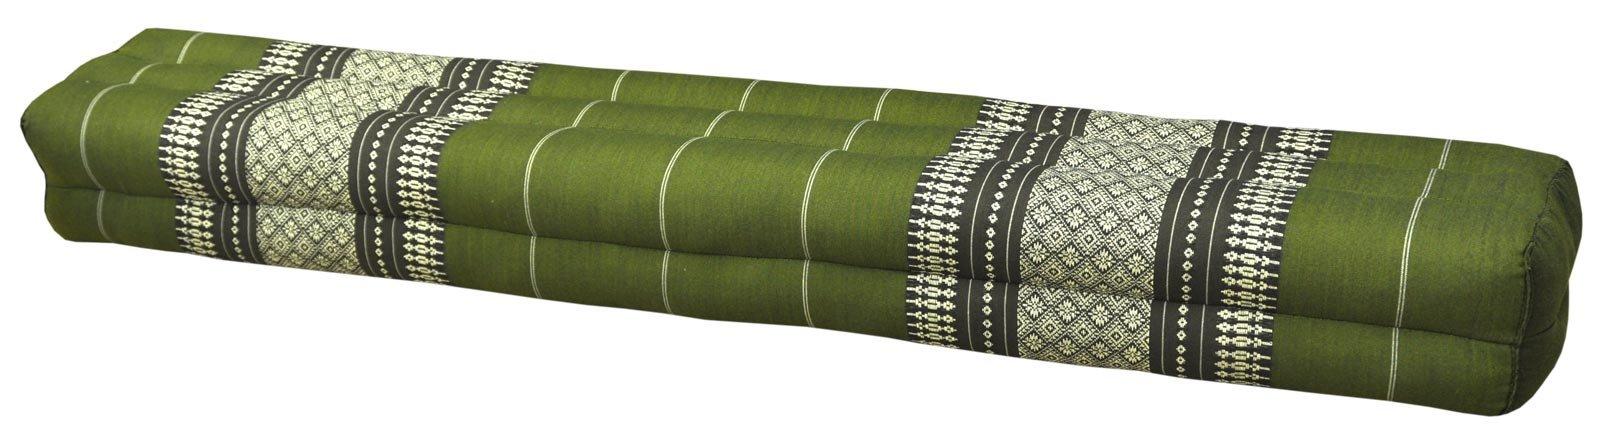 Thai cushion bolster , pillow, sofa, imported from Thaïland, green, relaxation, beach, pool, meditation garden (81811)